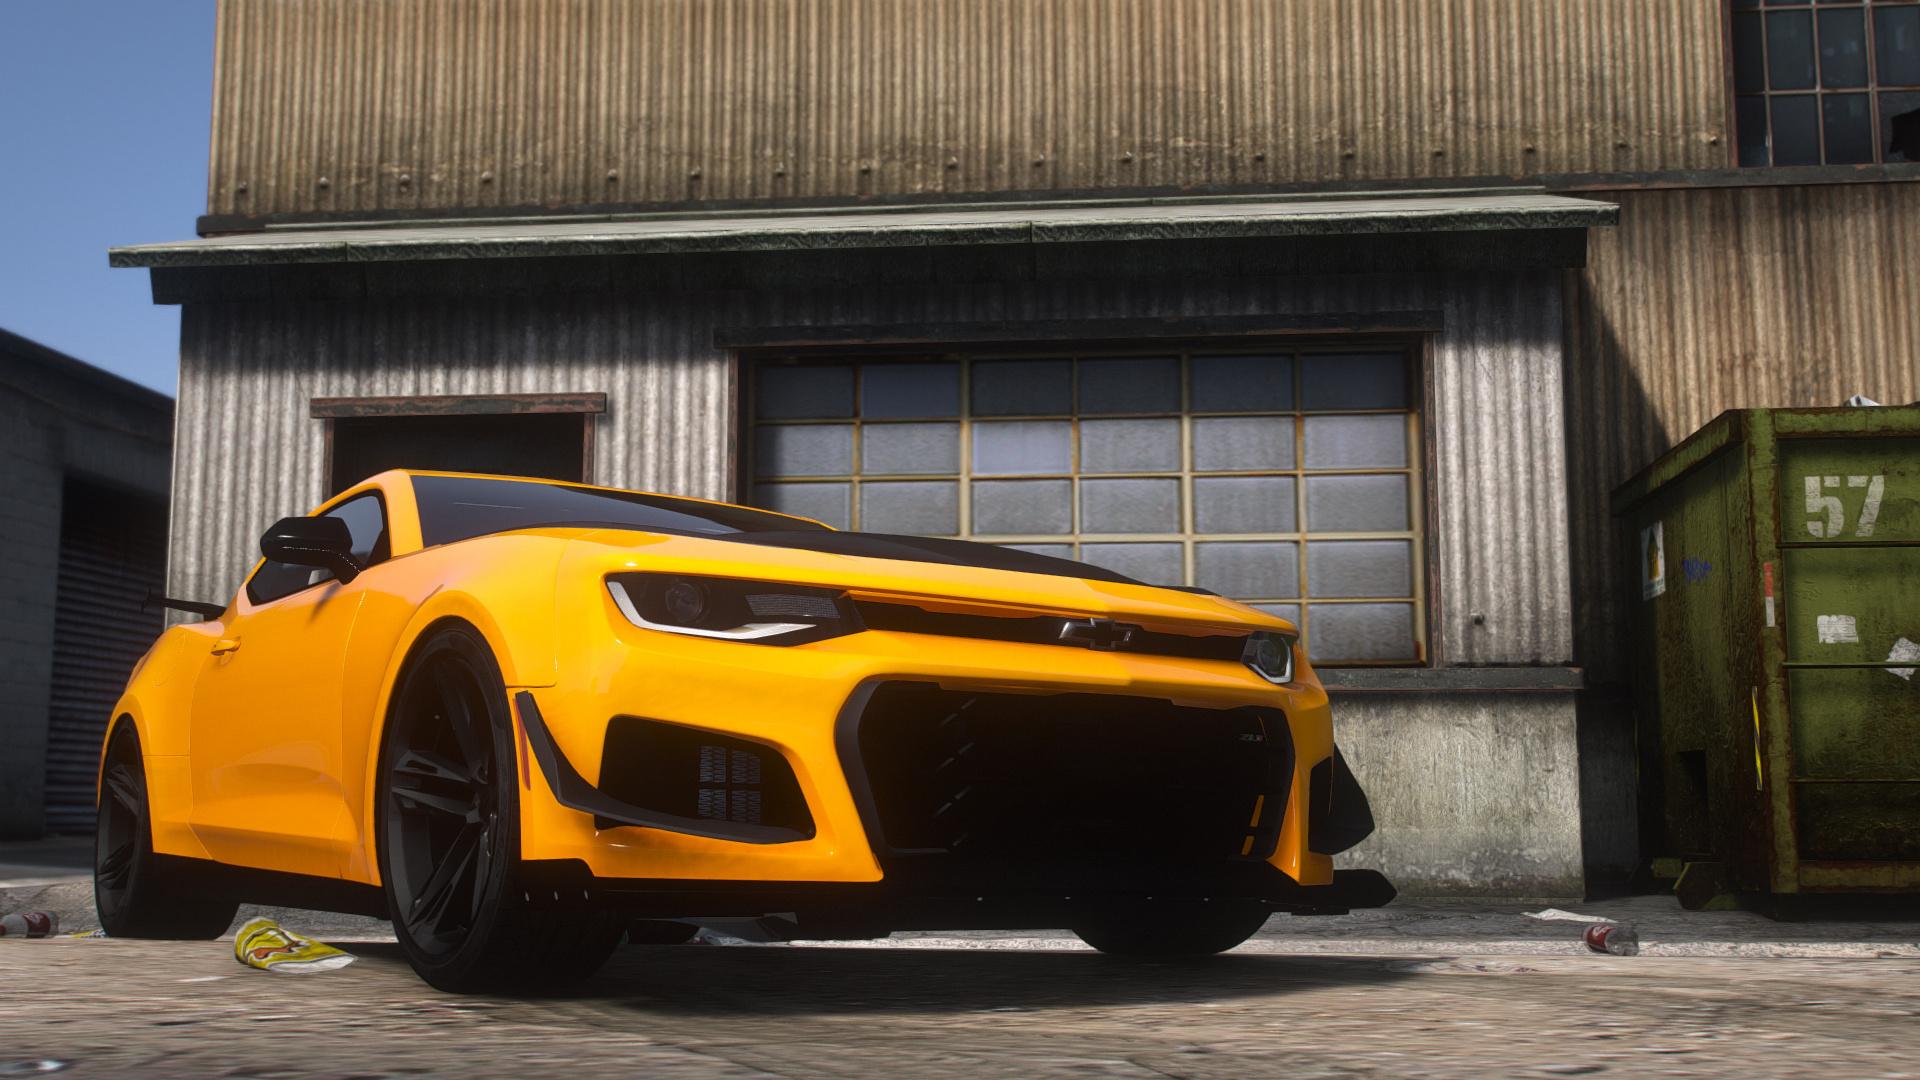 accd55-yellow.jpg